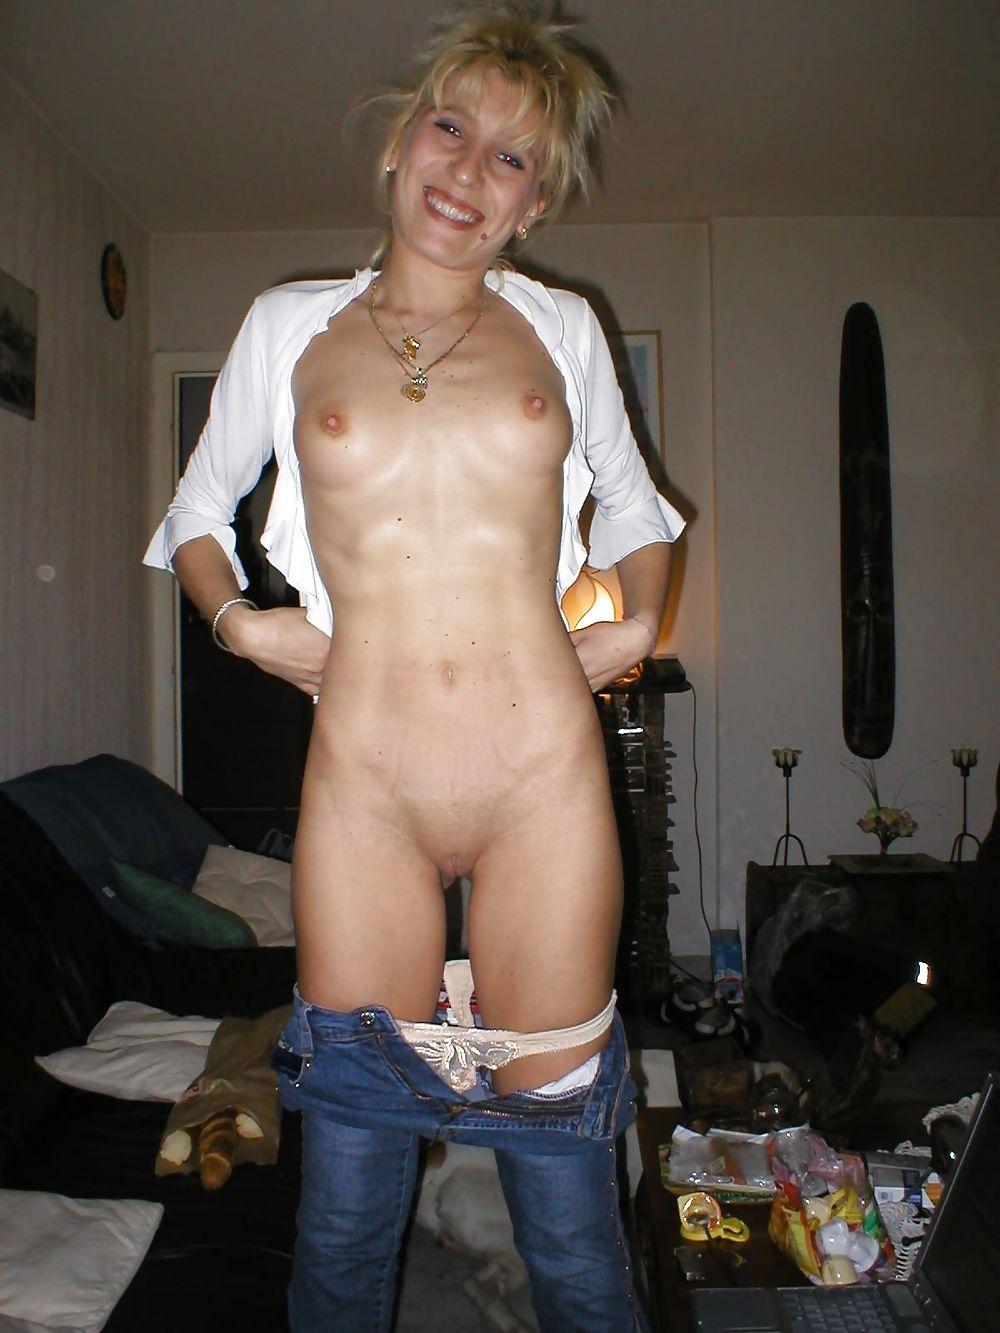 Skinny wife posing nude — 7